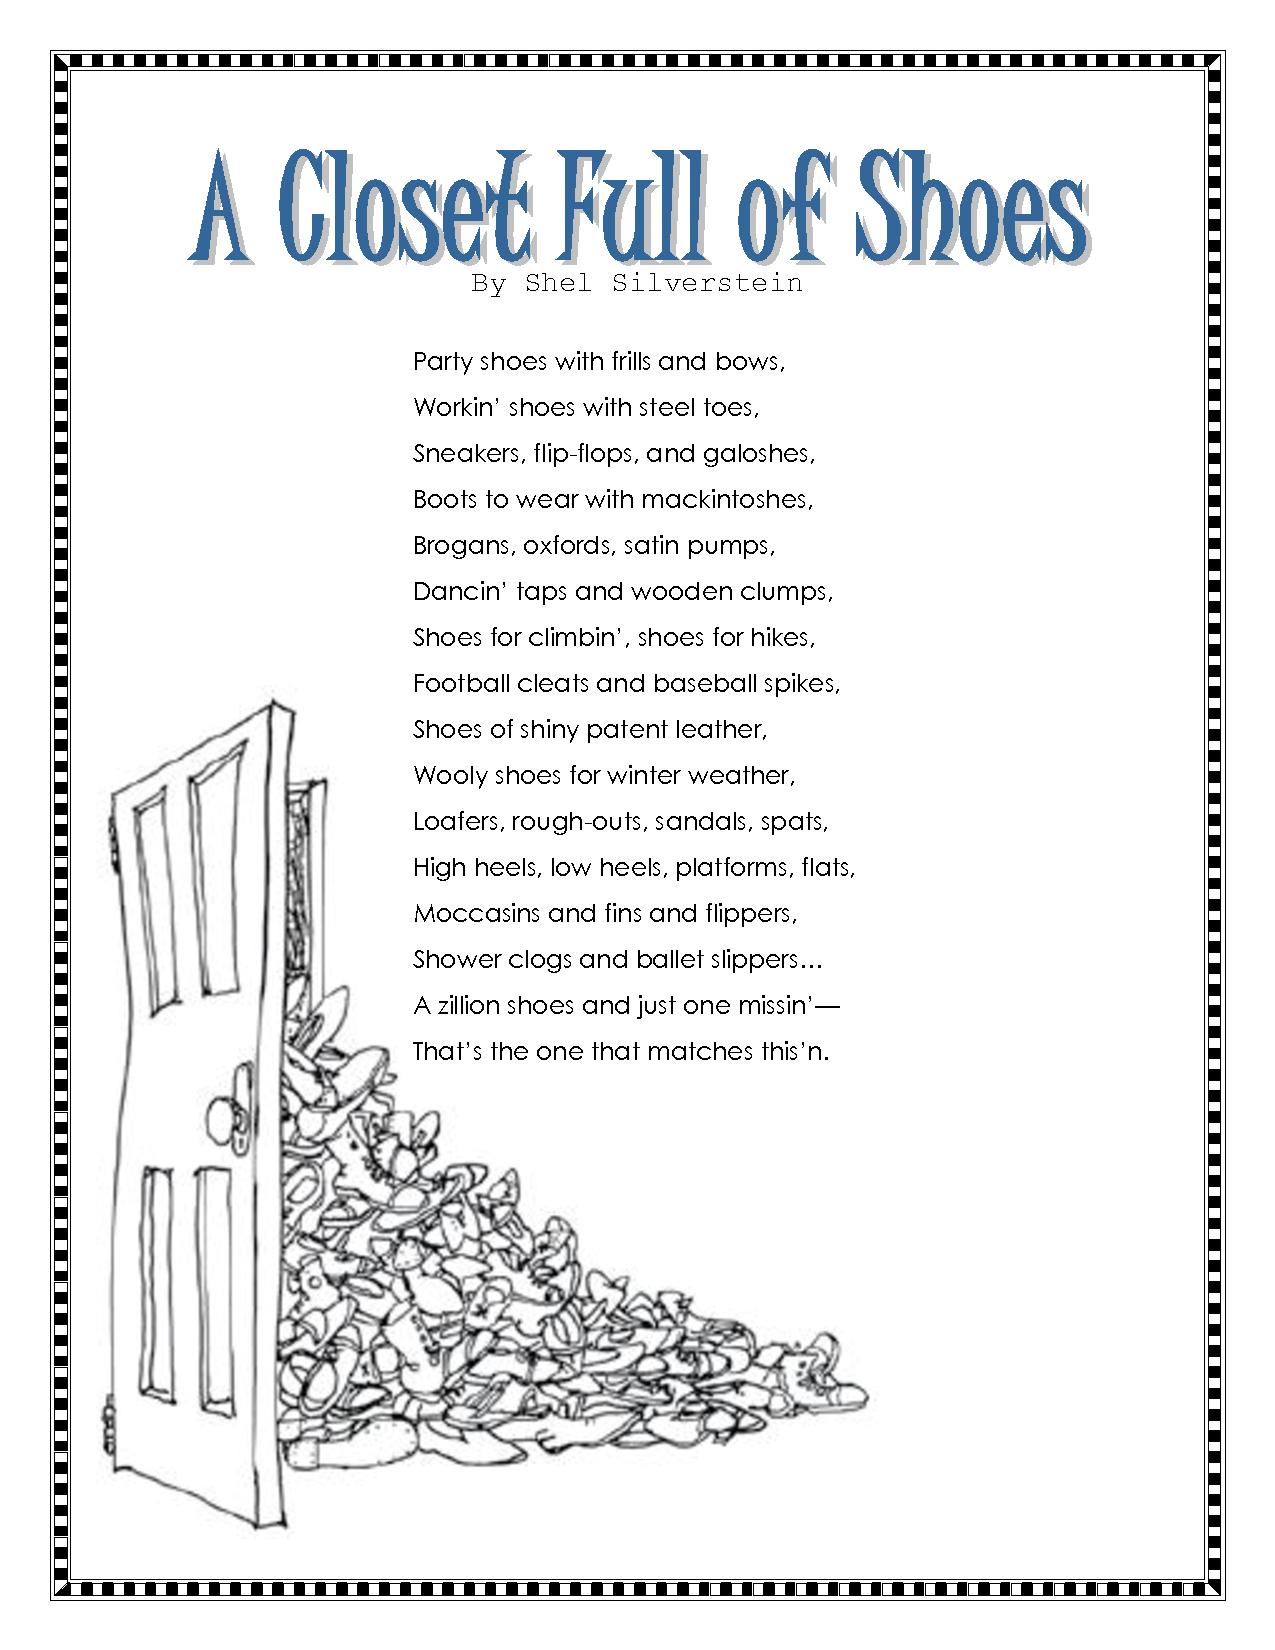 worksheet Shel Silverstein Worksheets closet full of shoes by shel silverstein silverstein